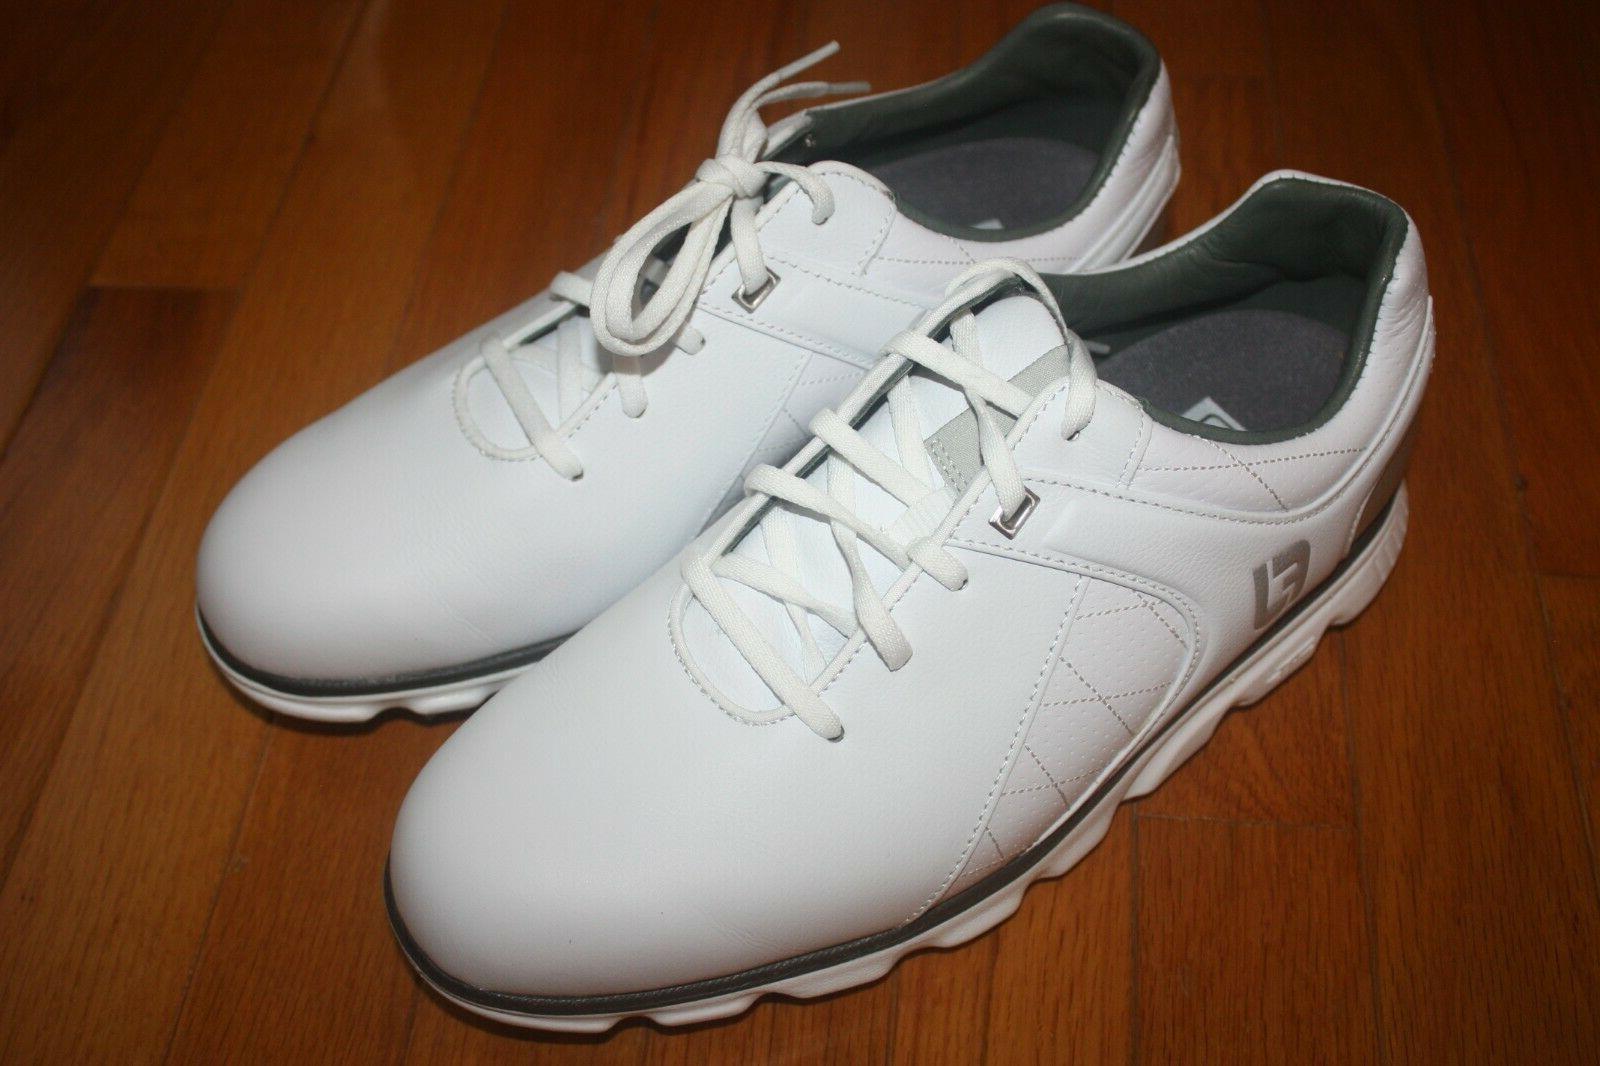 New Box Men's Spikeless Golf Shoes FREE